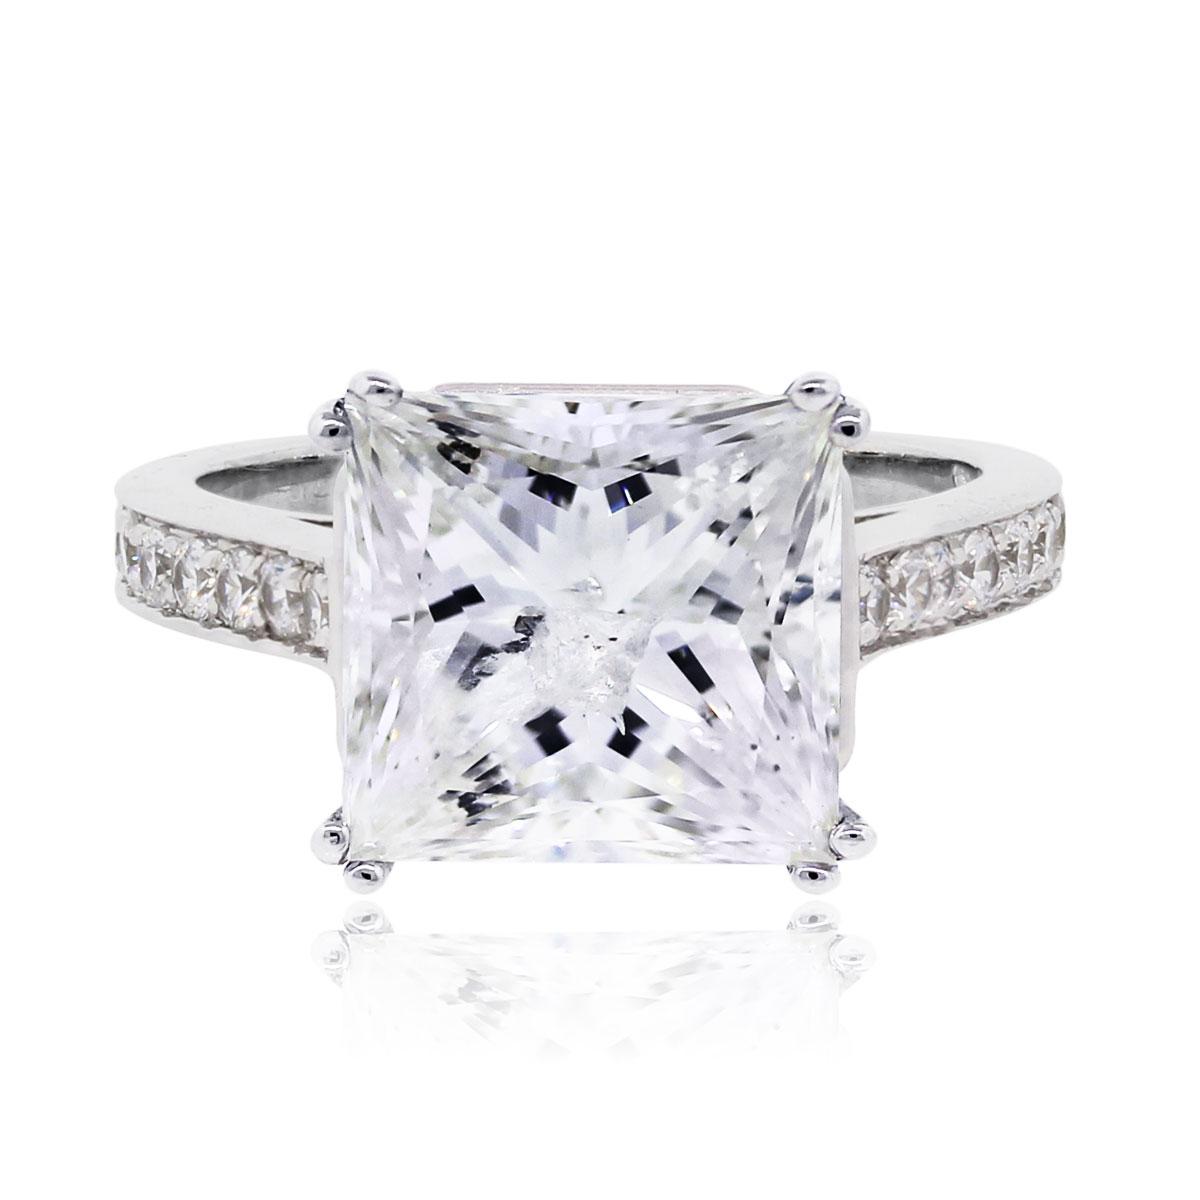 14k White Gold Princess Cut Diamond Engagement Ring 5.54ct